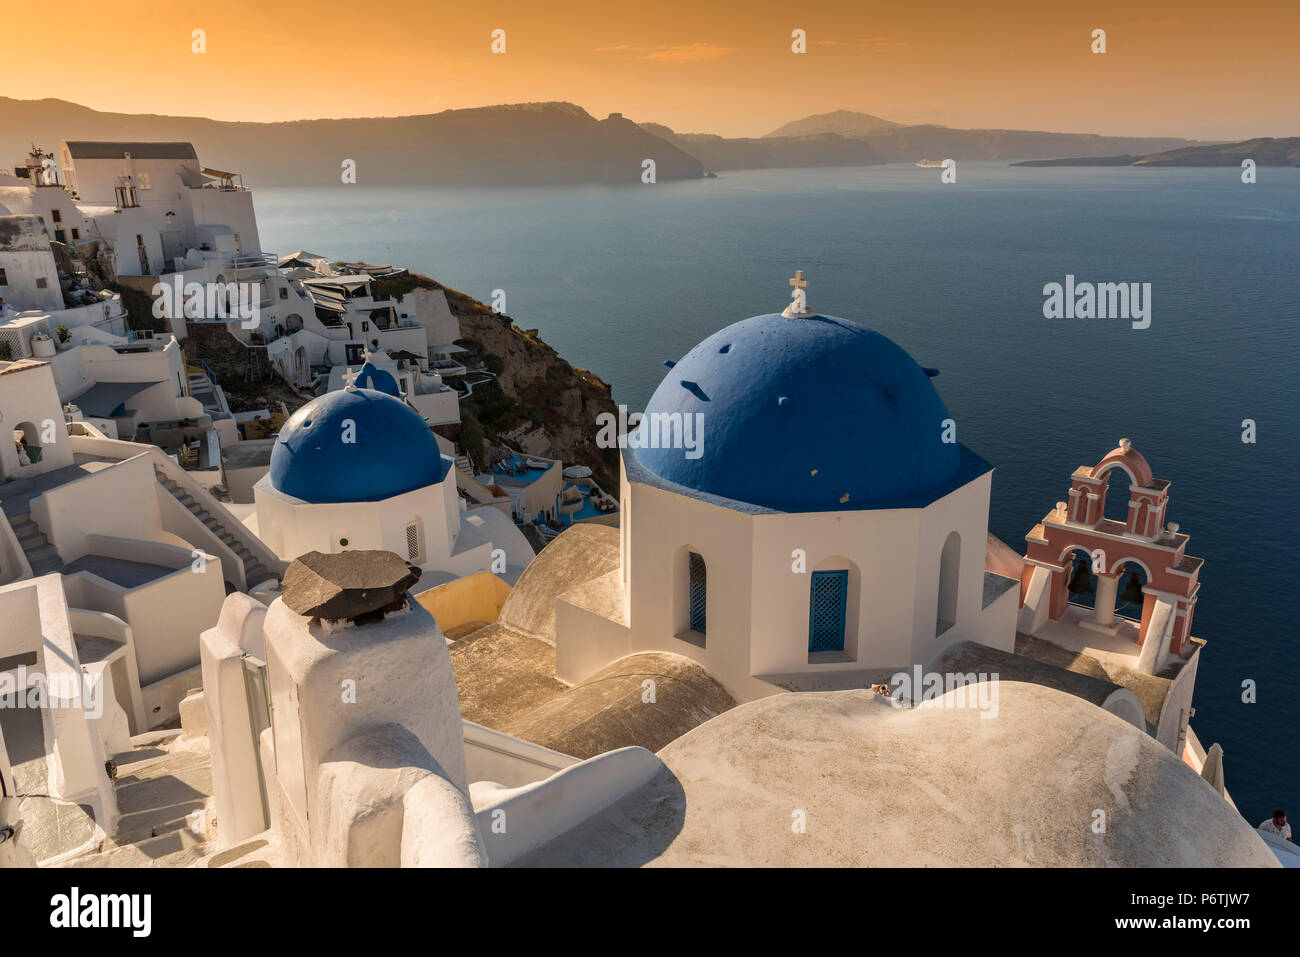 Sunrise pittoresque voir à Oia, Santorini, sud de la mer Egée, Grèce Photo Stock